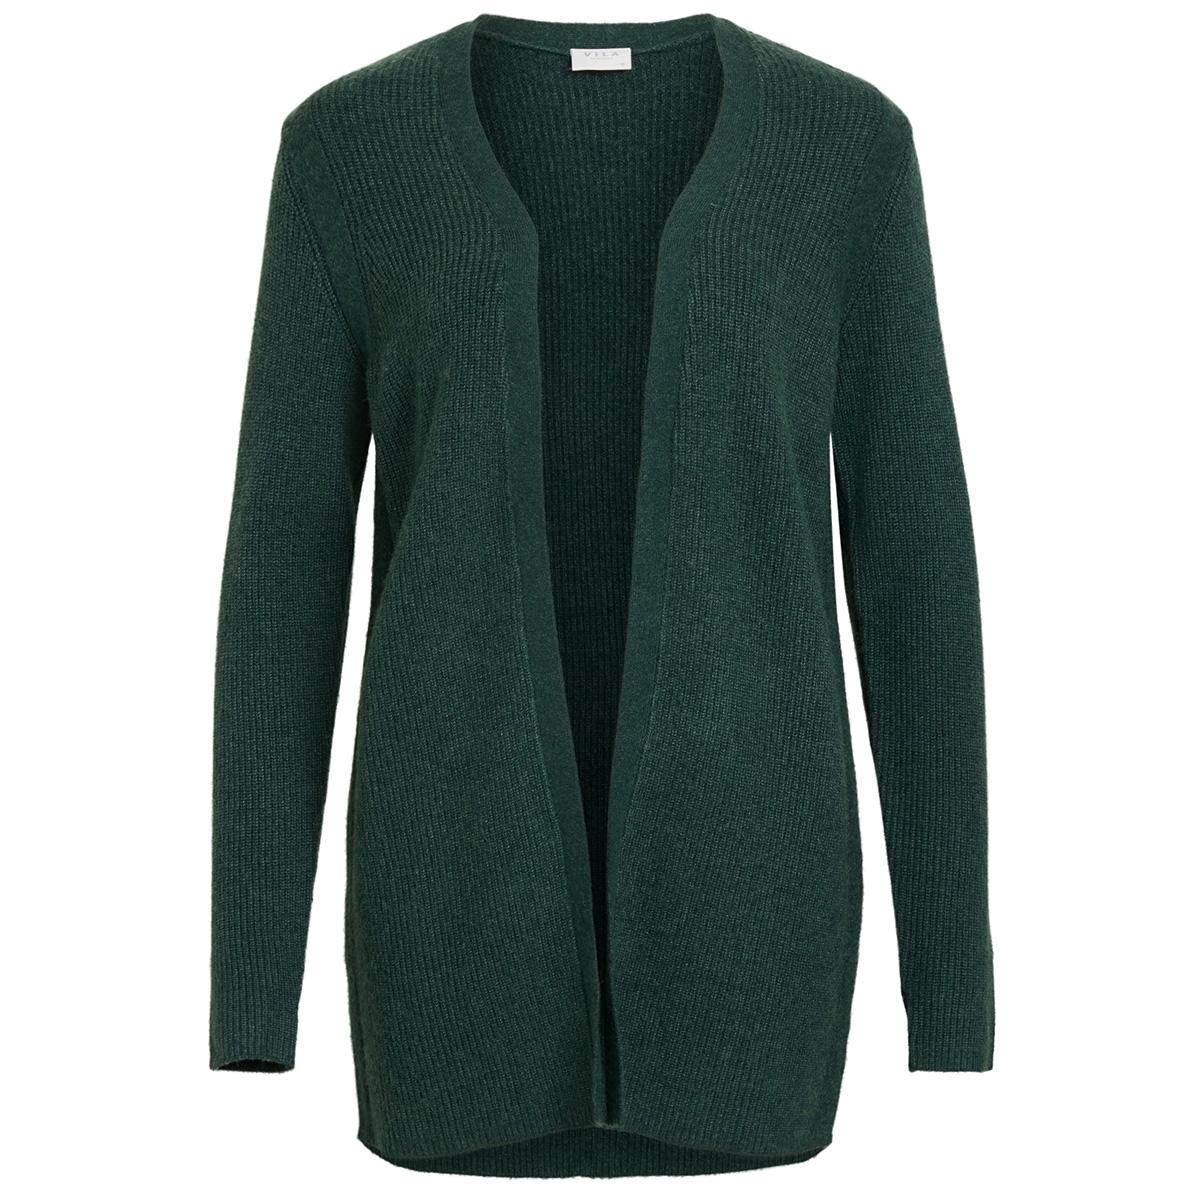 viril l/s  open knit rib cardigan 14051977 vila vest pine grove/melange